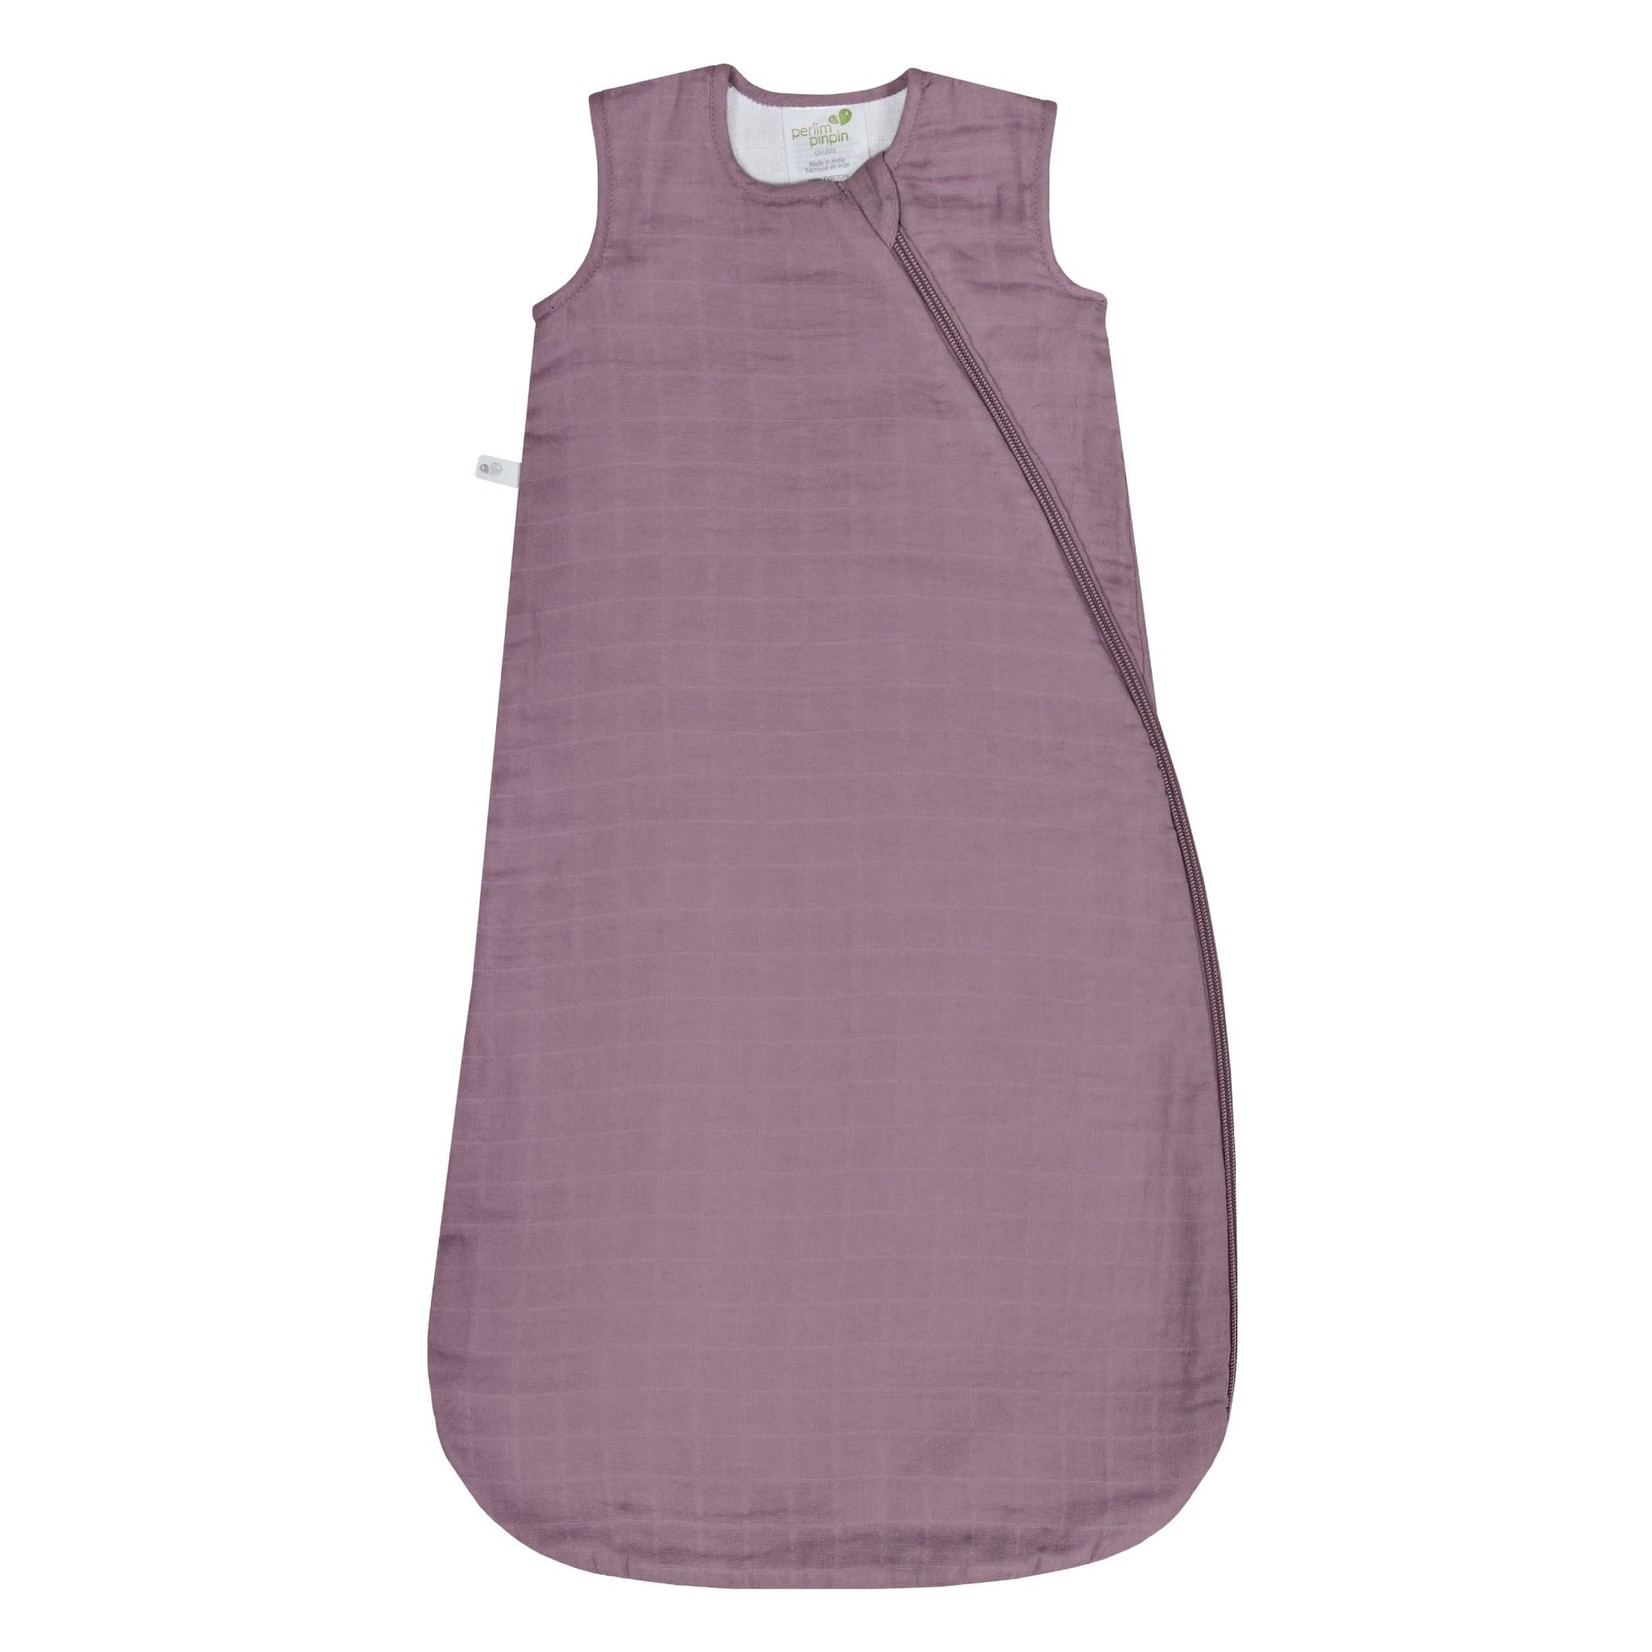 Cotton Muslin Sleep Bag - Plum - 0.7 TOG